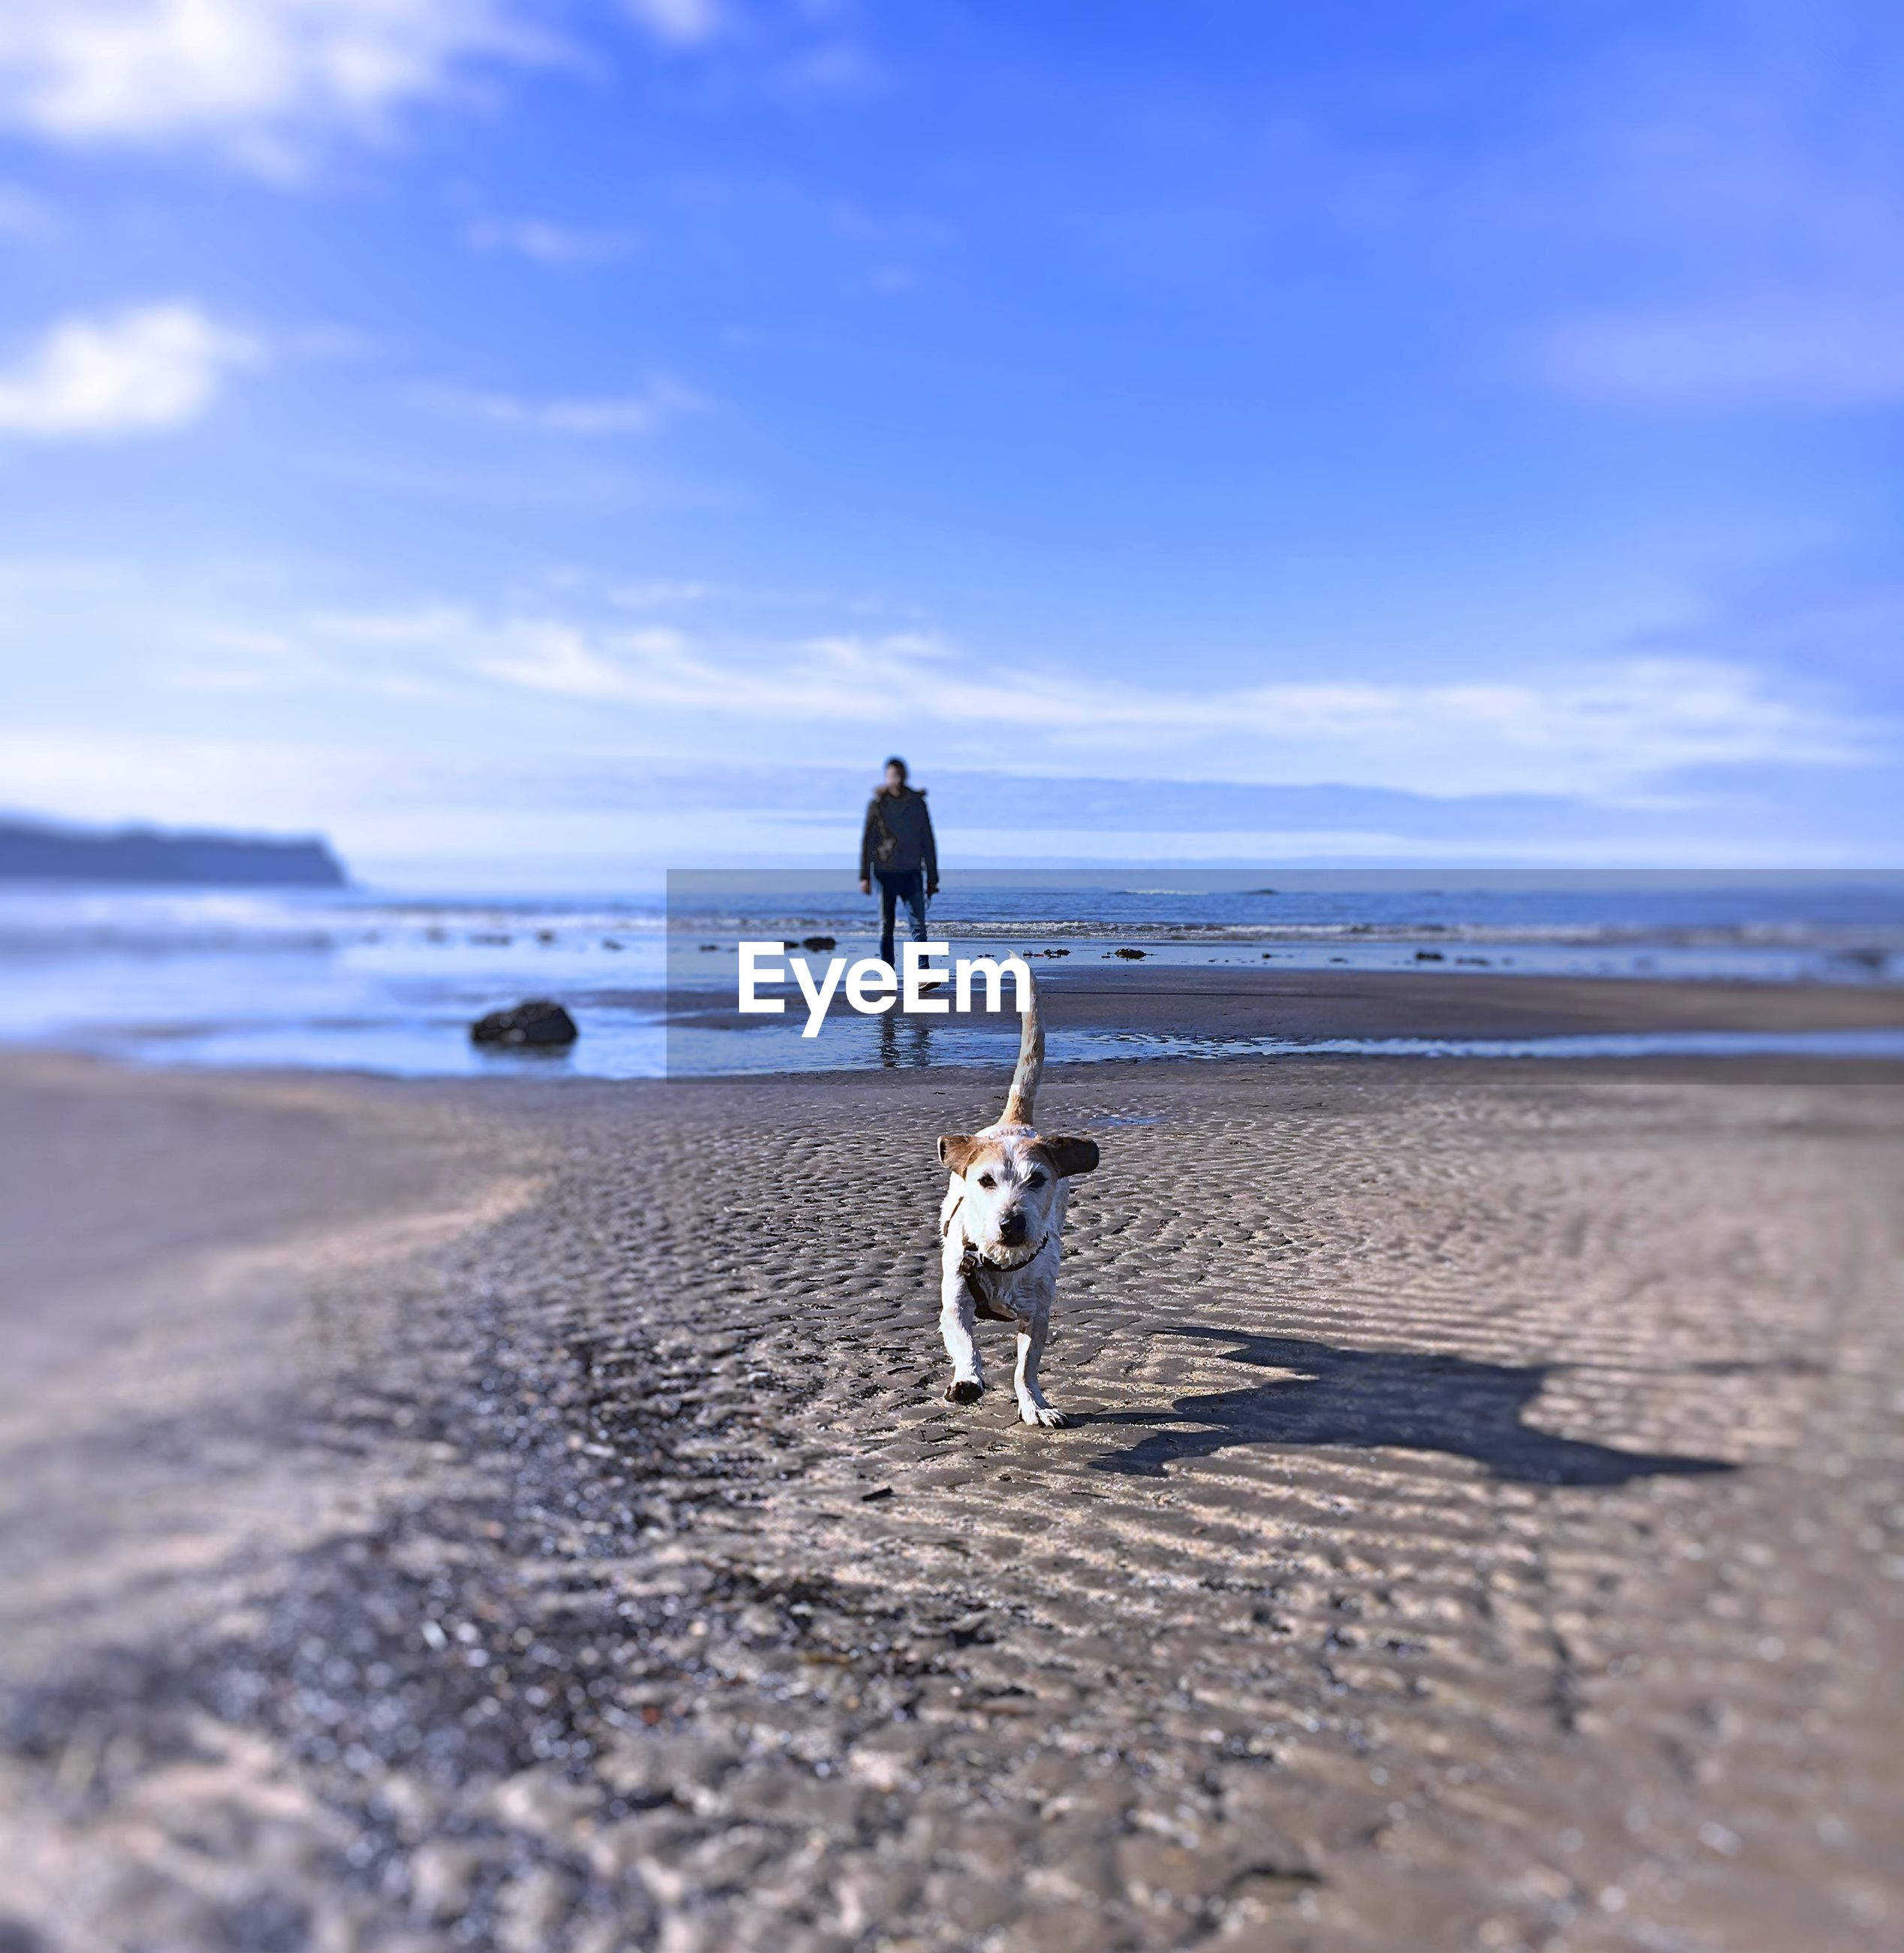 Dog walking at beach against sky